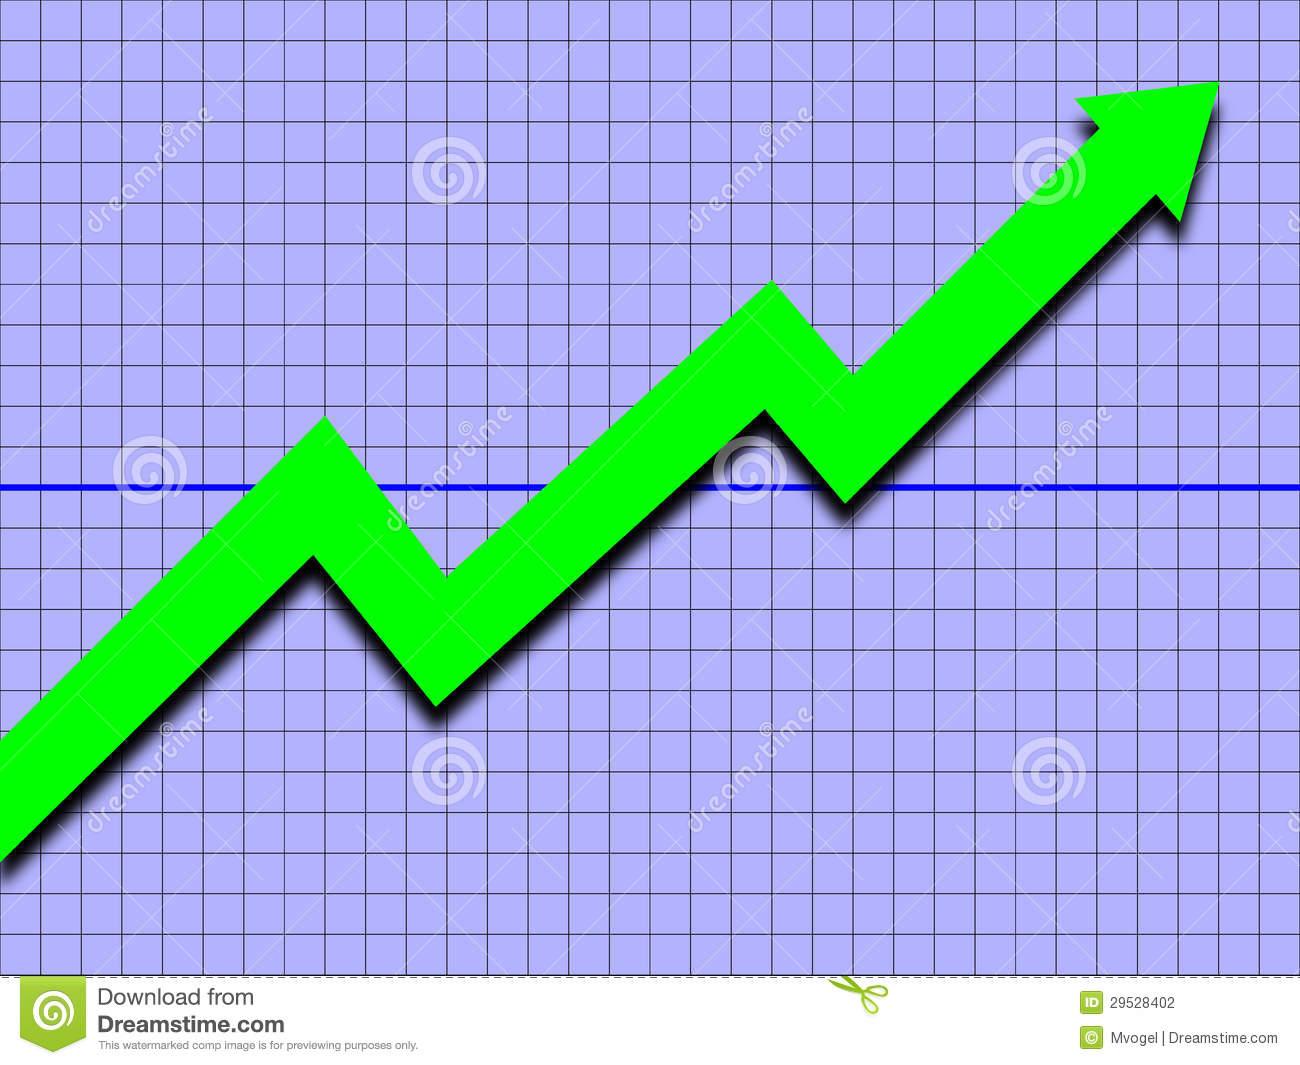 Upward trend clipart image black and white Upward Trend Stock Photography - Image: 29528402 image black and white